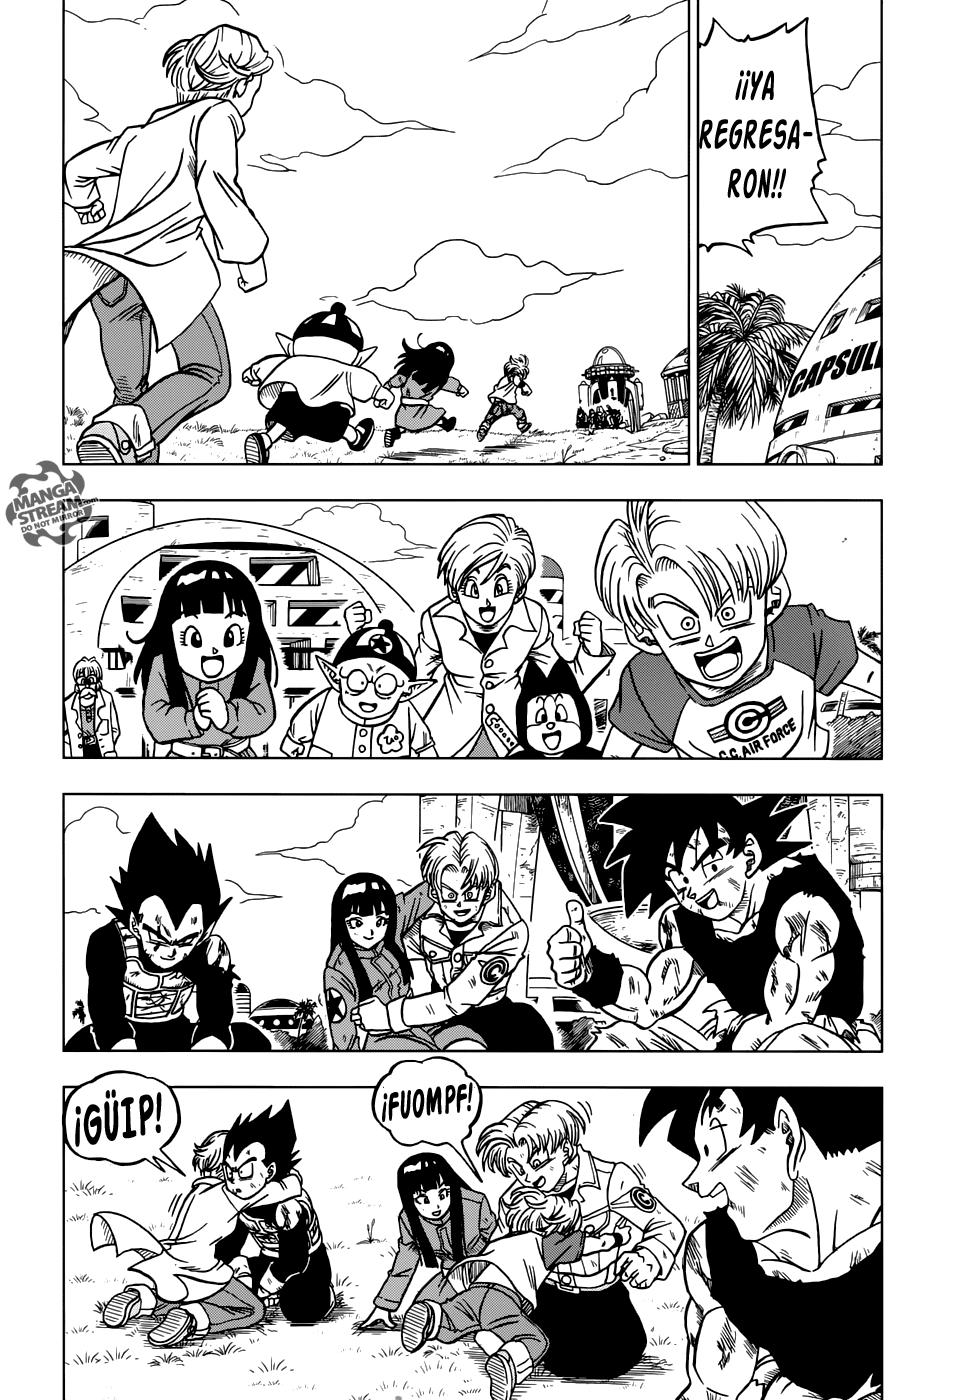 Pagina 24 - Manga 26 - Dragon Ball Super